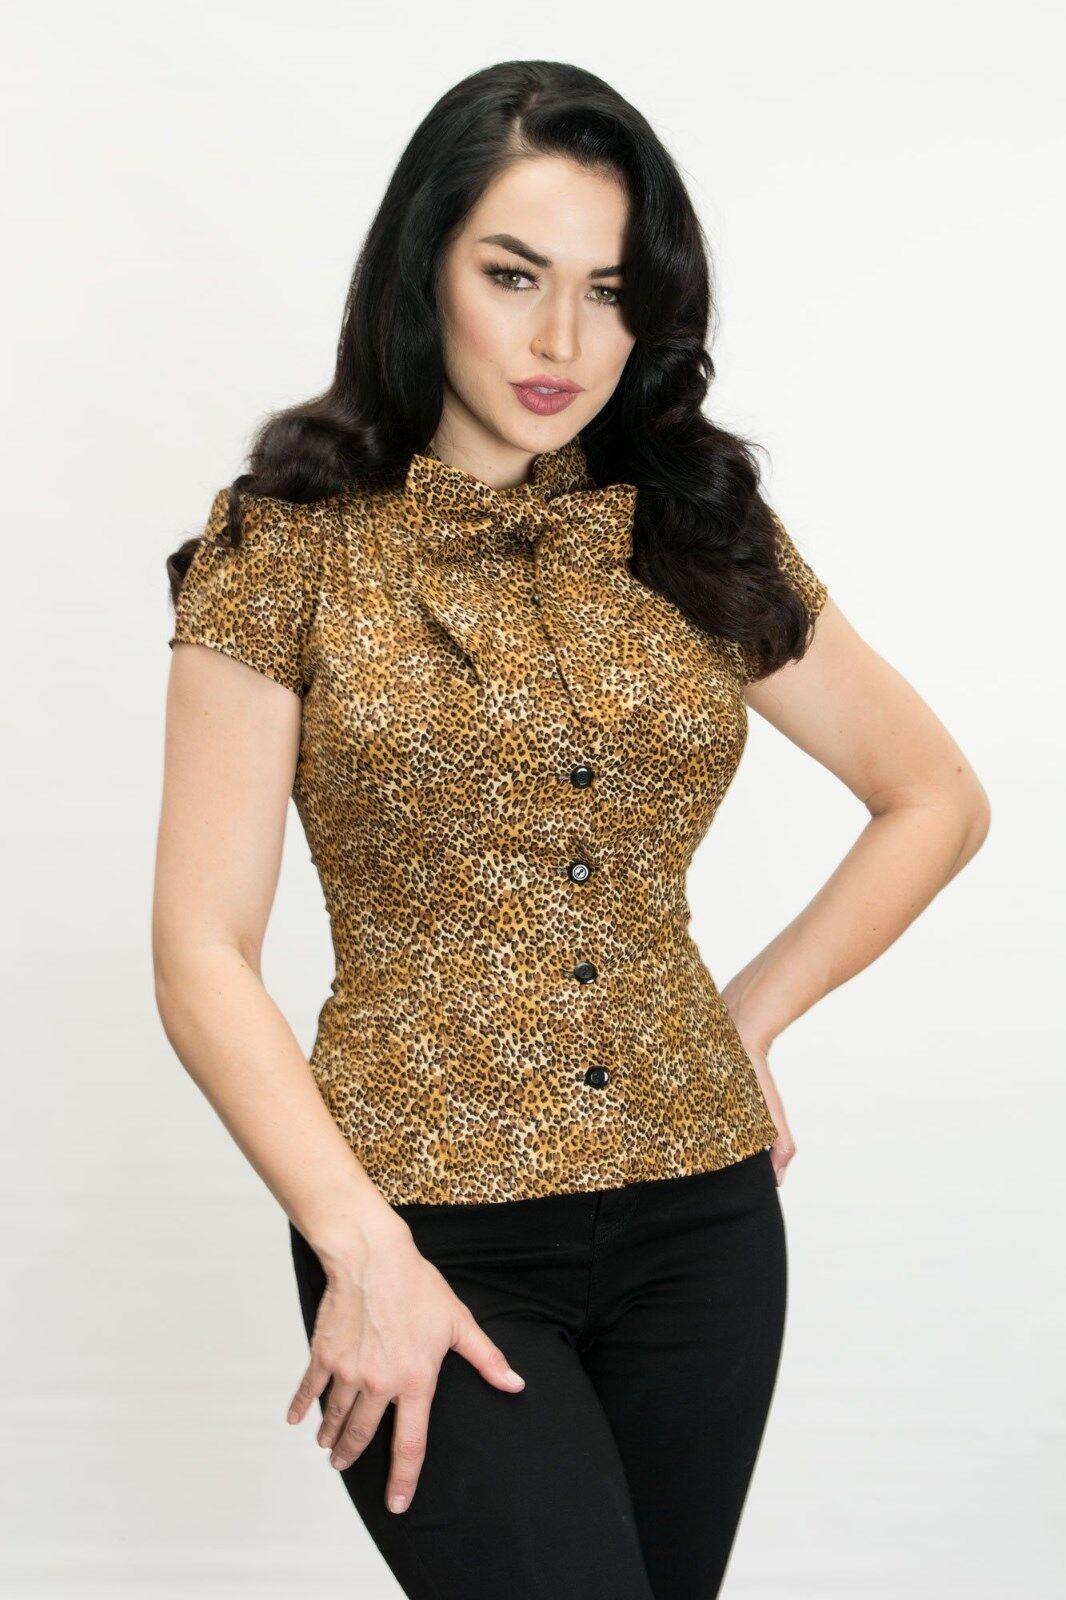 Heart Of Haute Estelle USA 12.2ms Inspiration Kurzärmelige BlauSE Leopard M